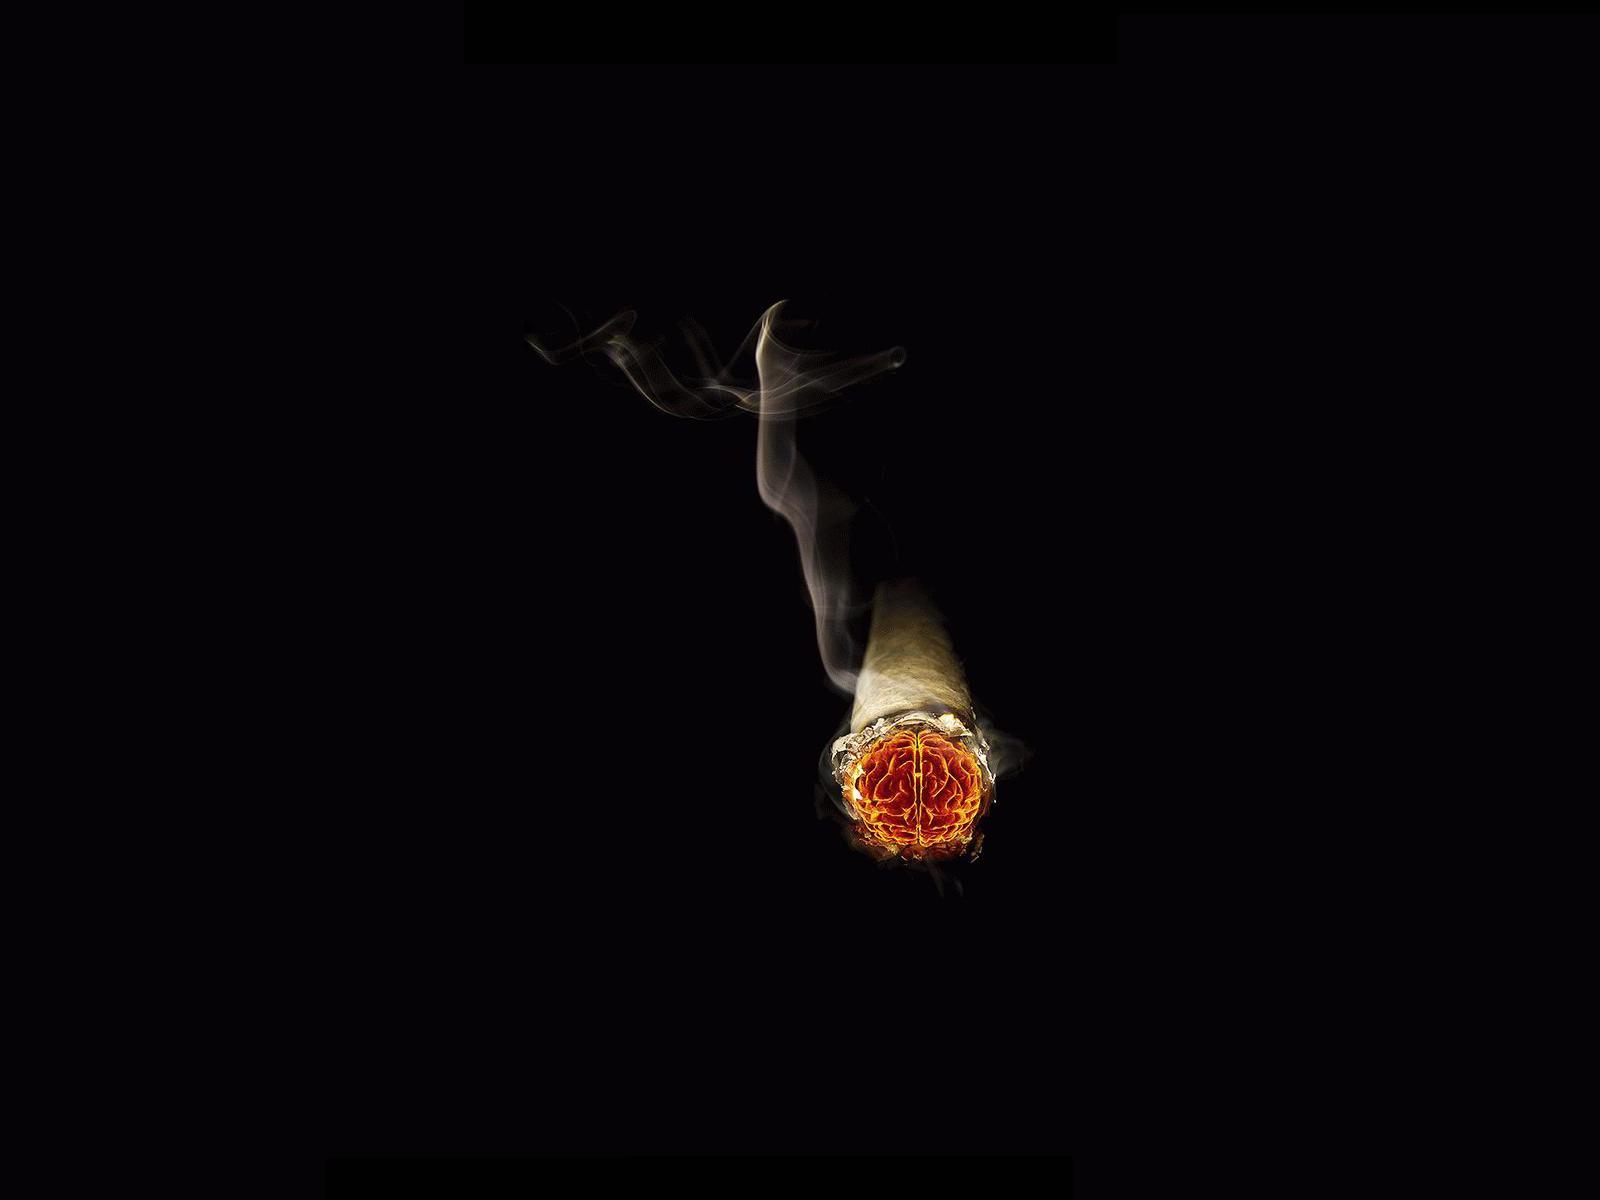 cigar smoke brains artwork deep thoughts HD Wallpaper 1600x1200